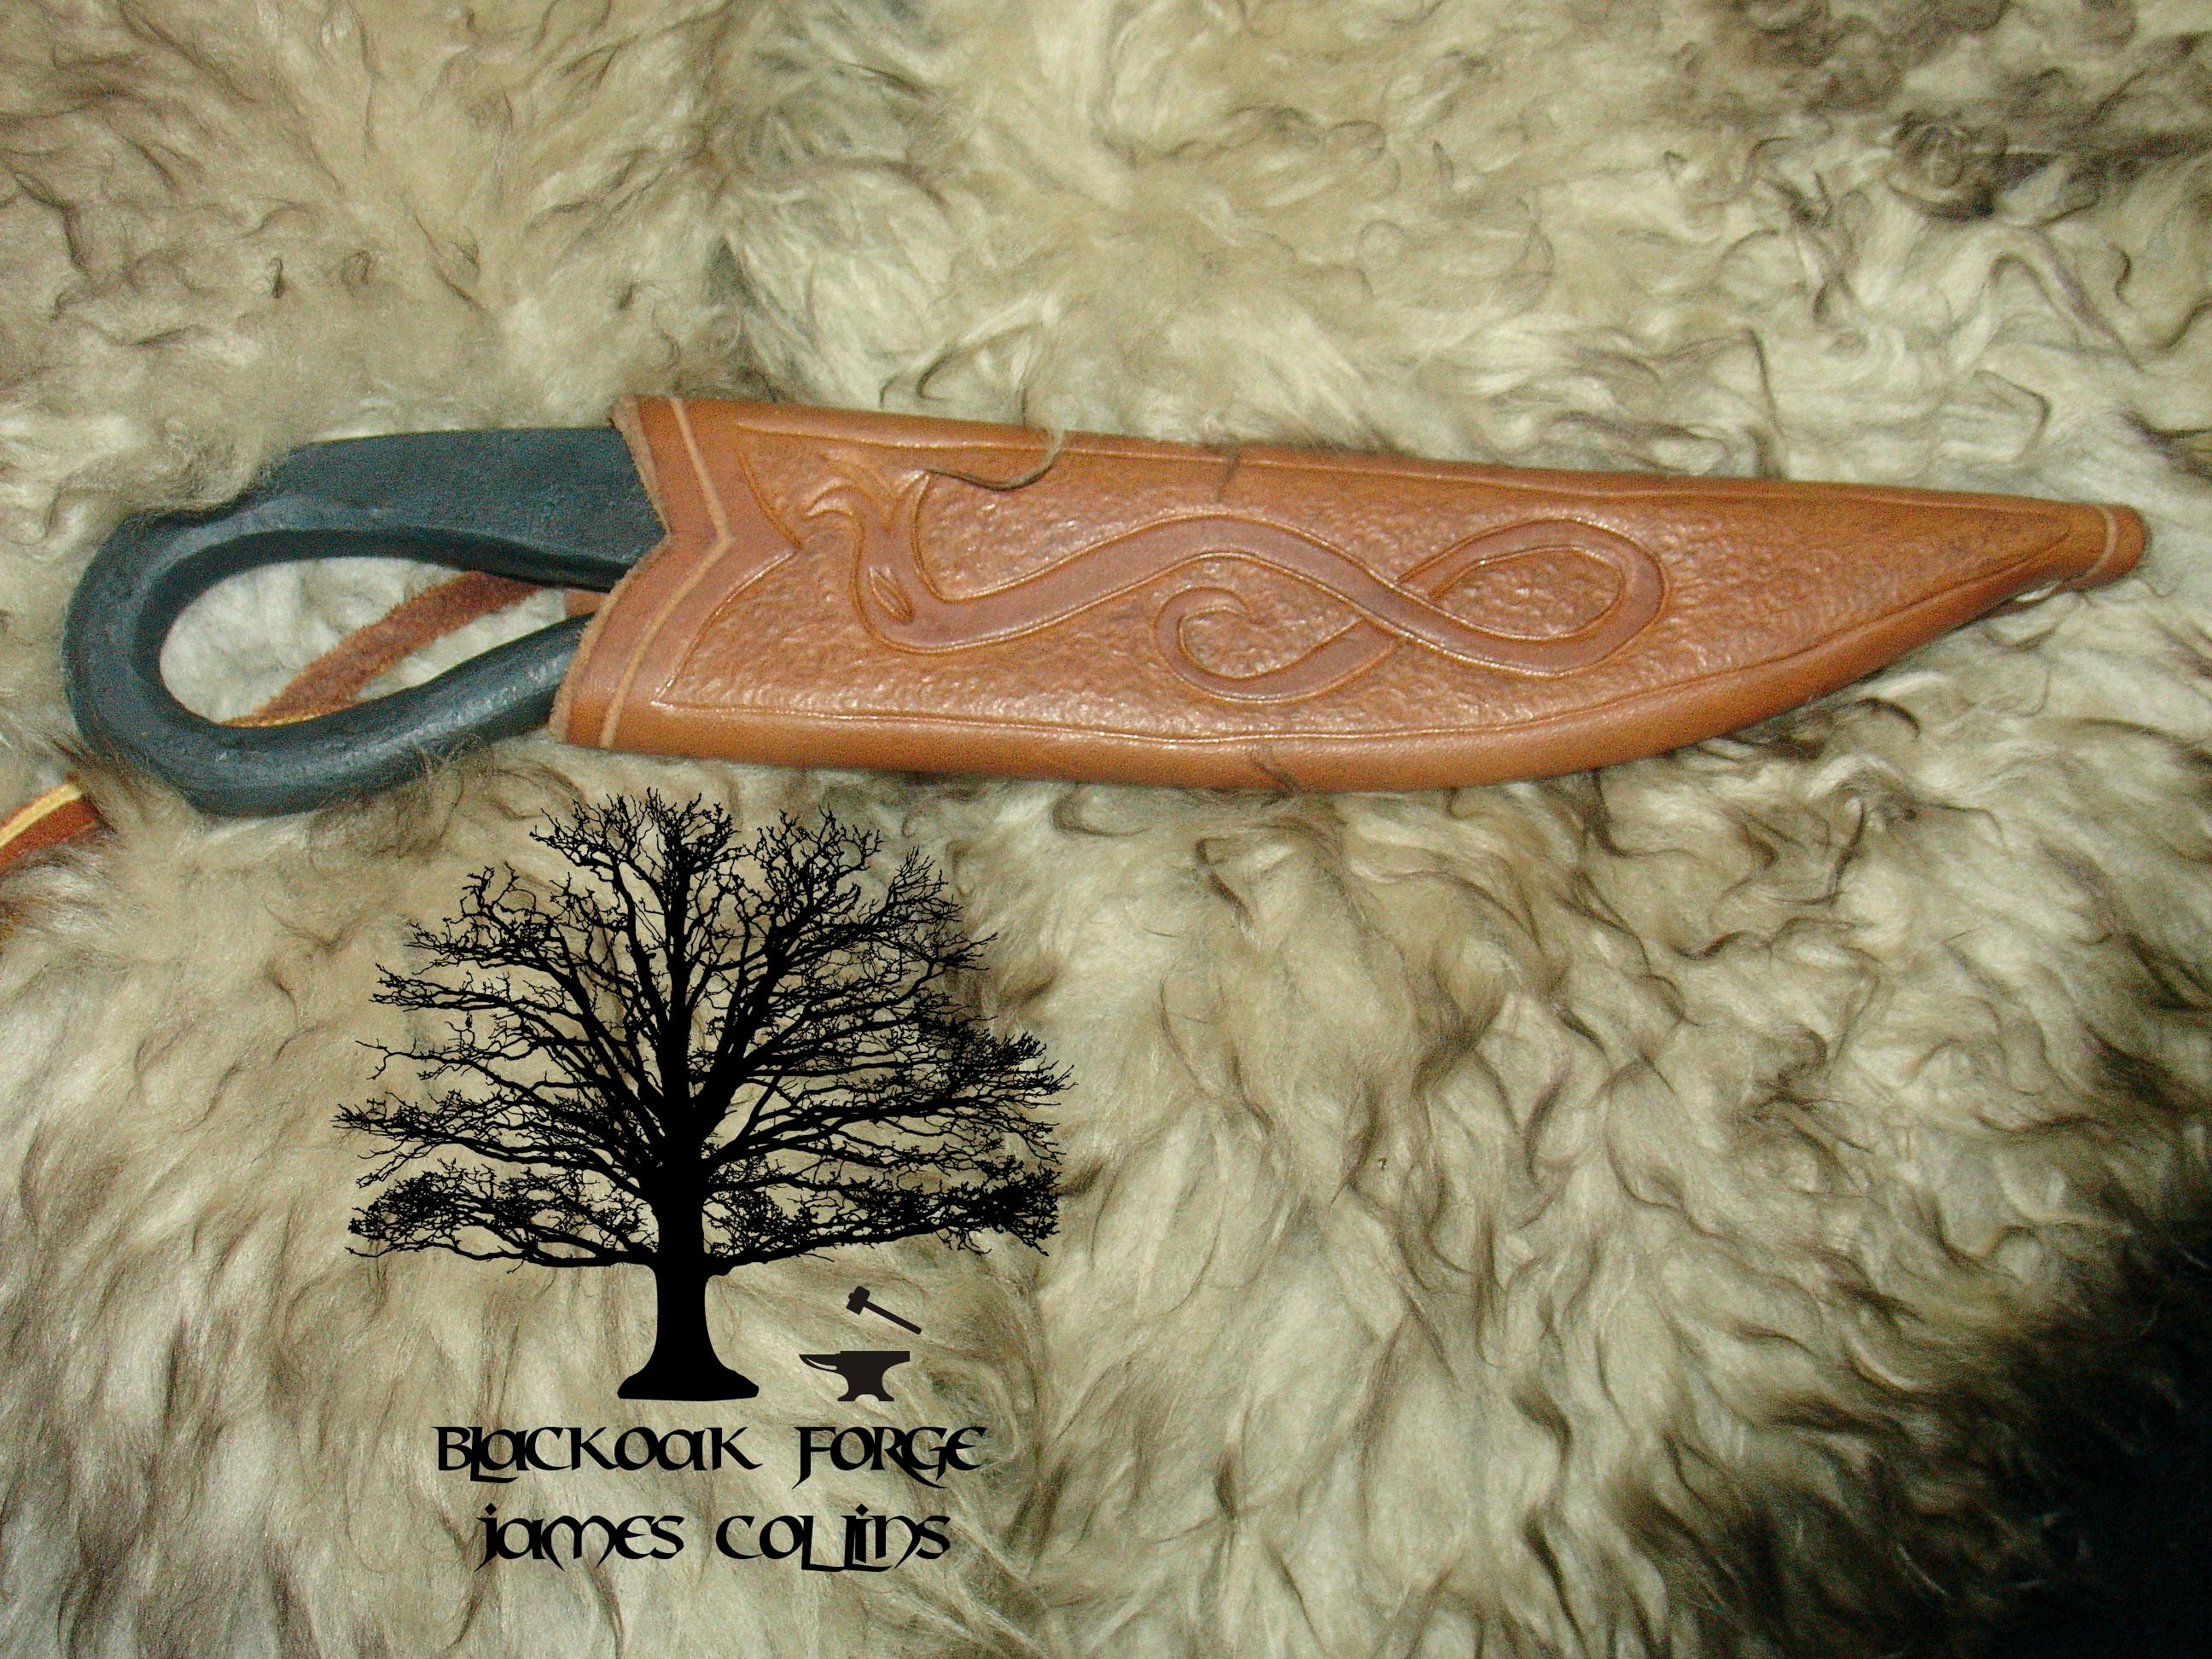 Flint Striker Knife by James Collins Blackoak Forge (3)